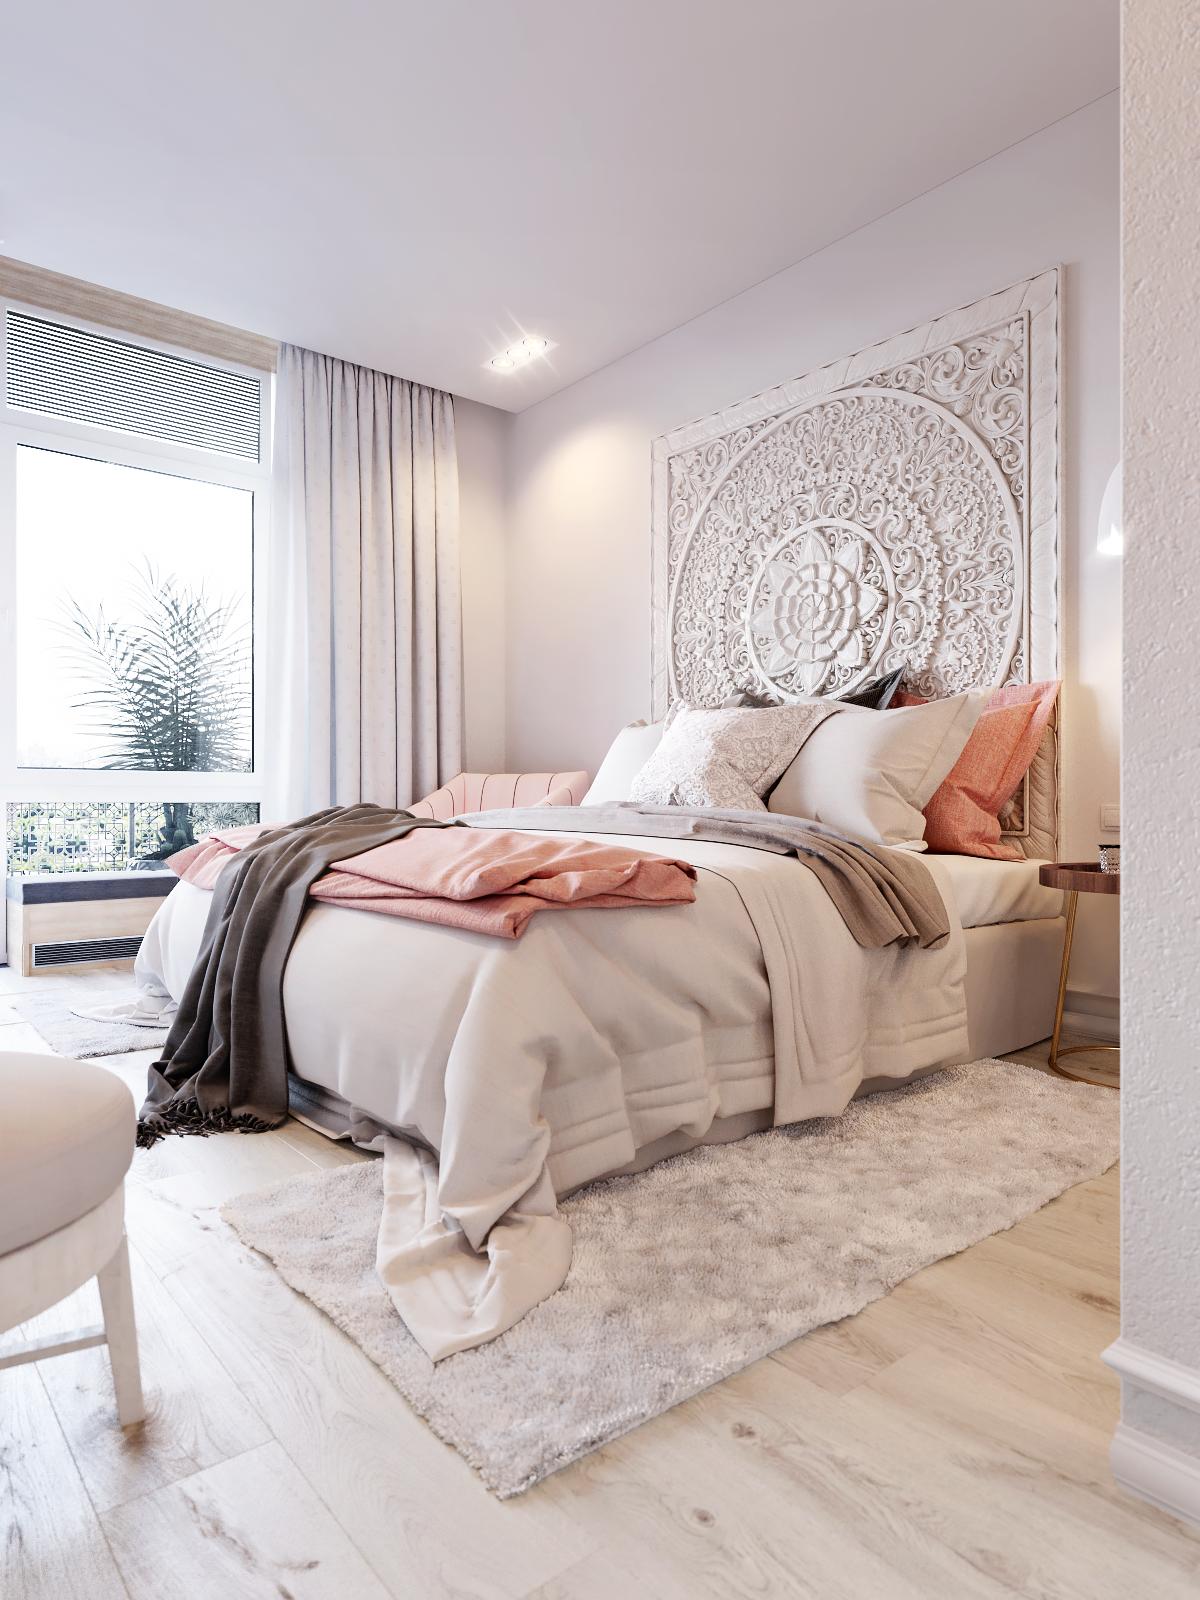 Interior Decorating Bedroom Pink White On Behance Very Relaxing Bedrooms Interiordesign